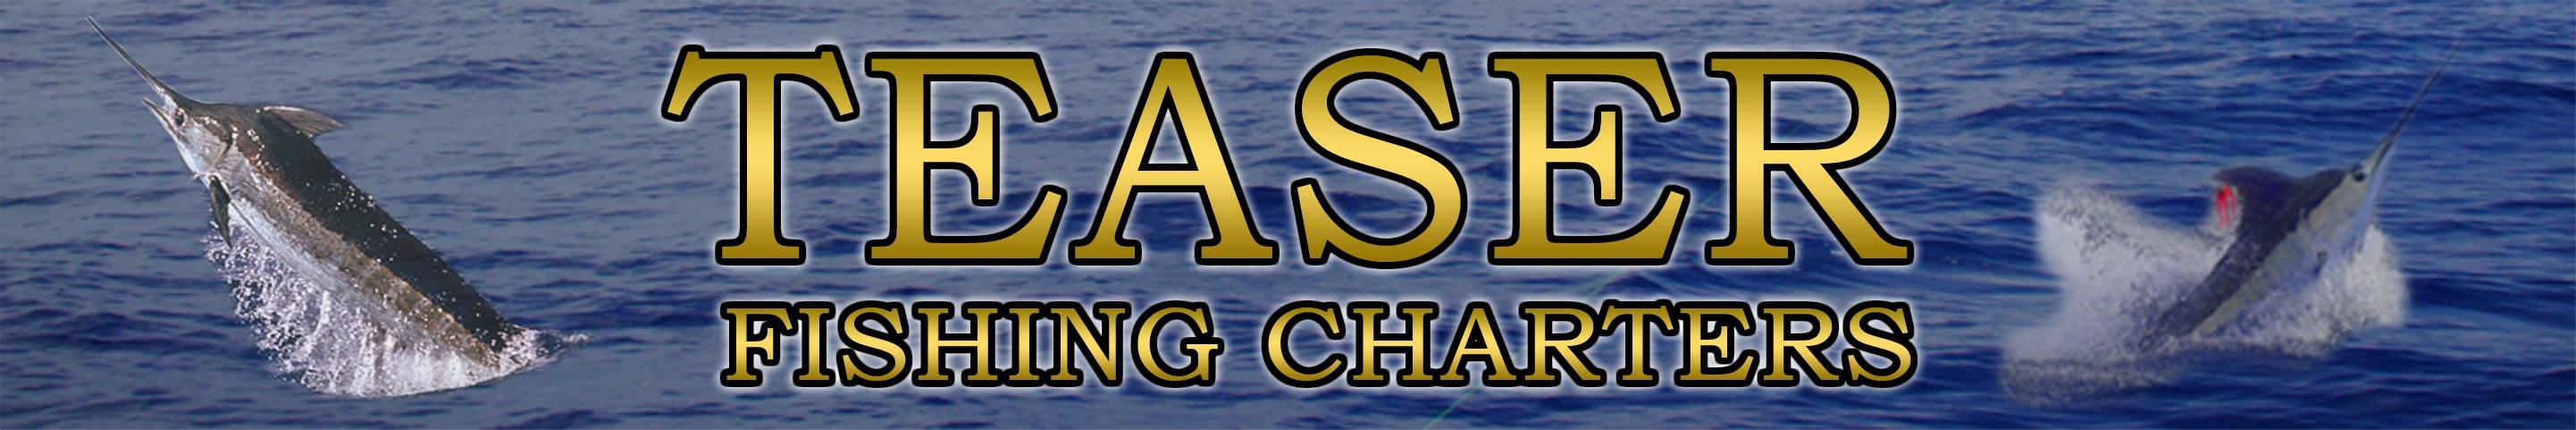 Teaser Charters Aruba